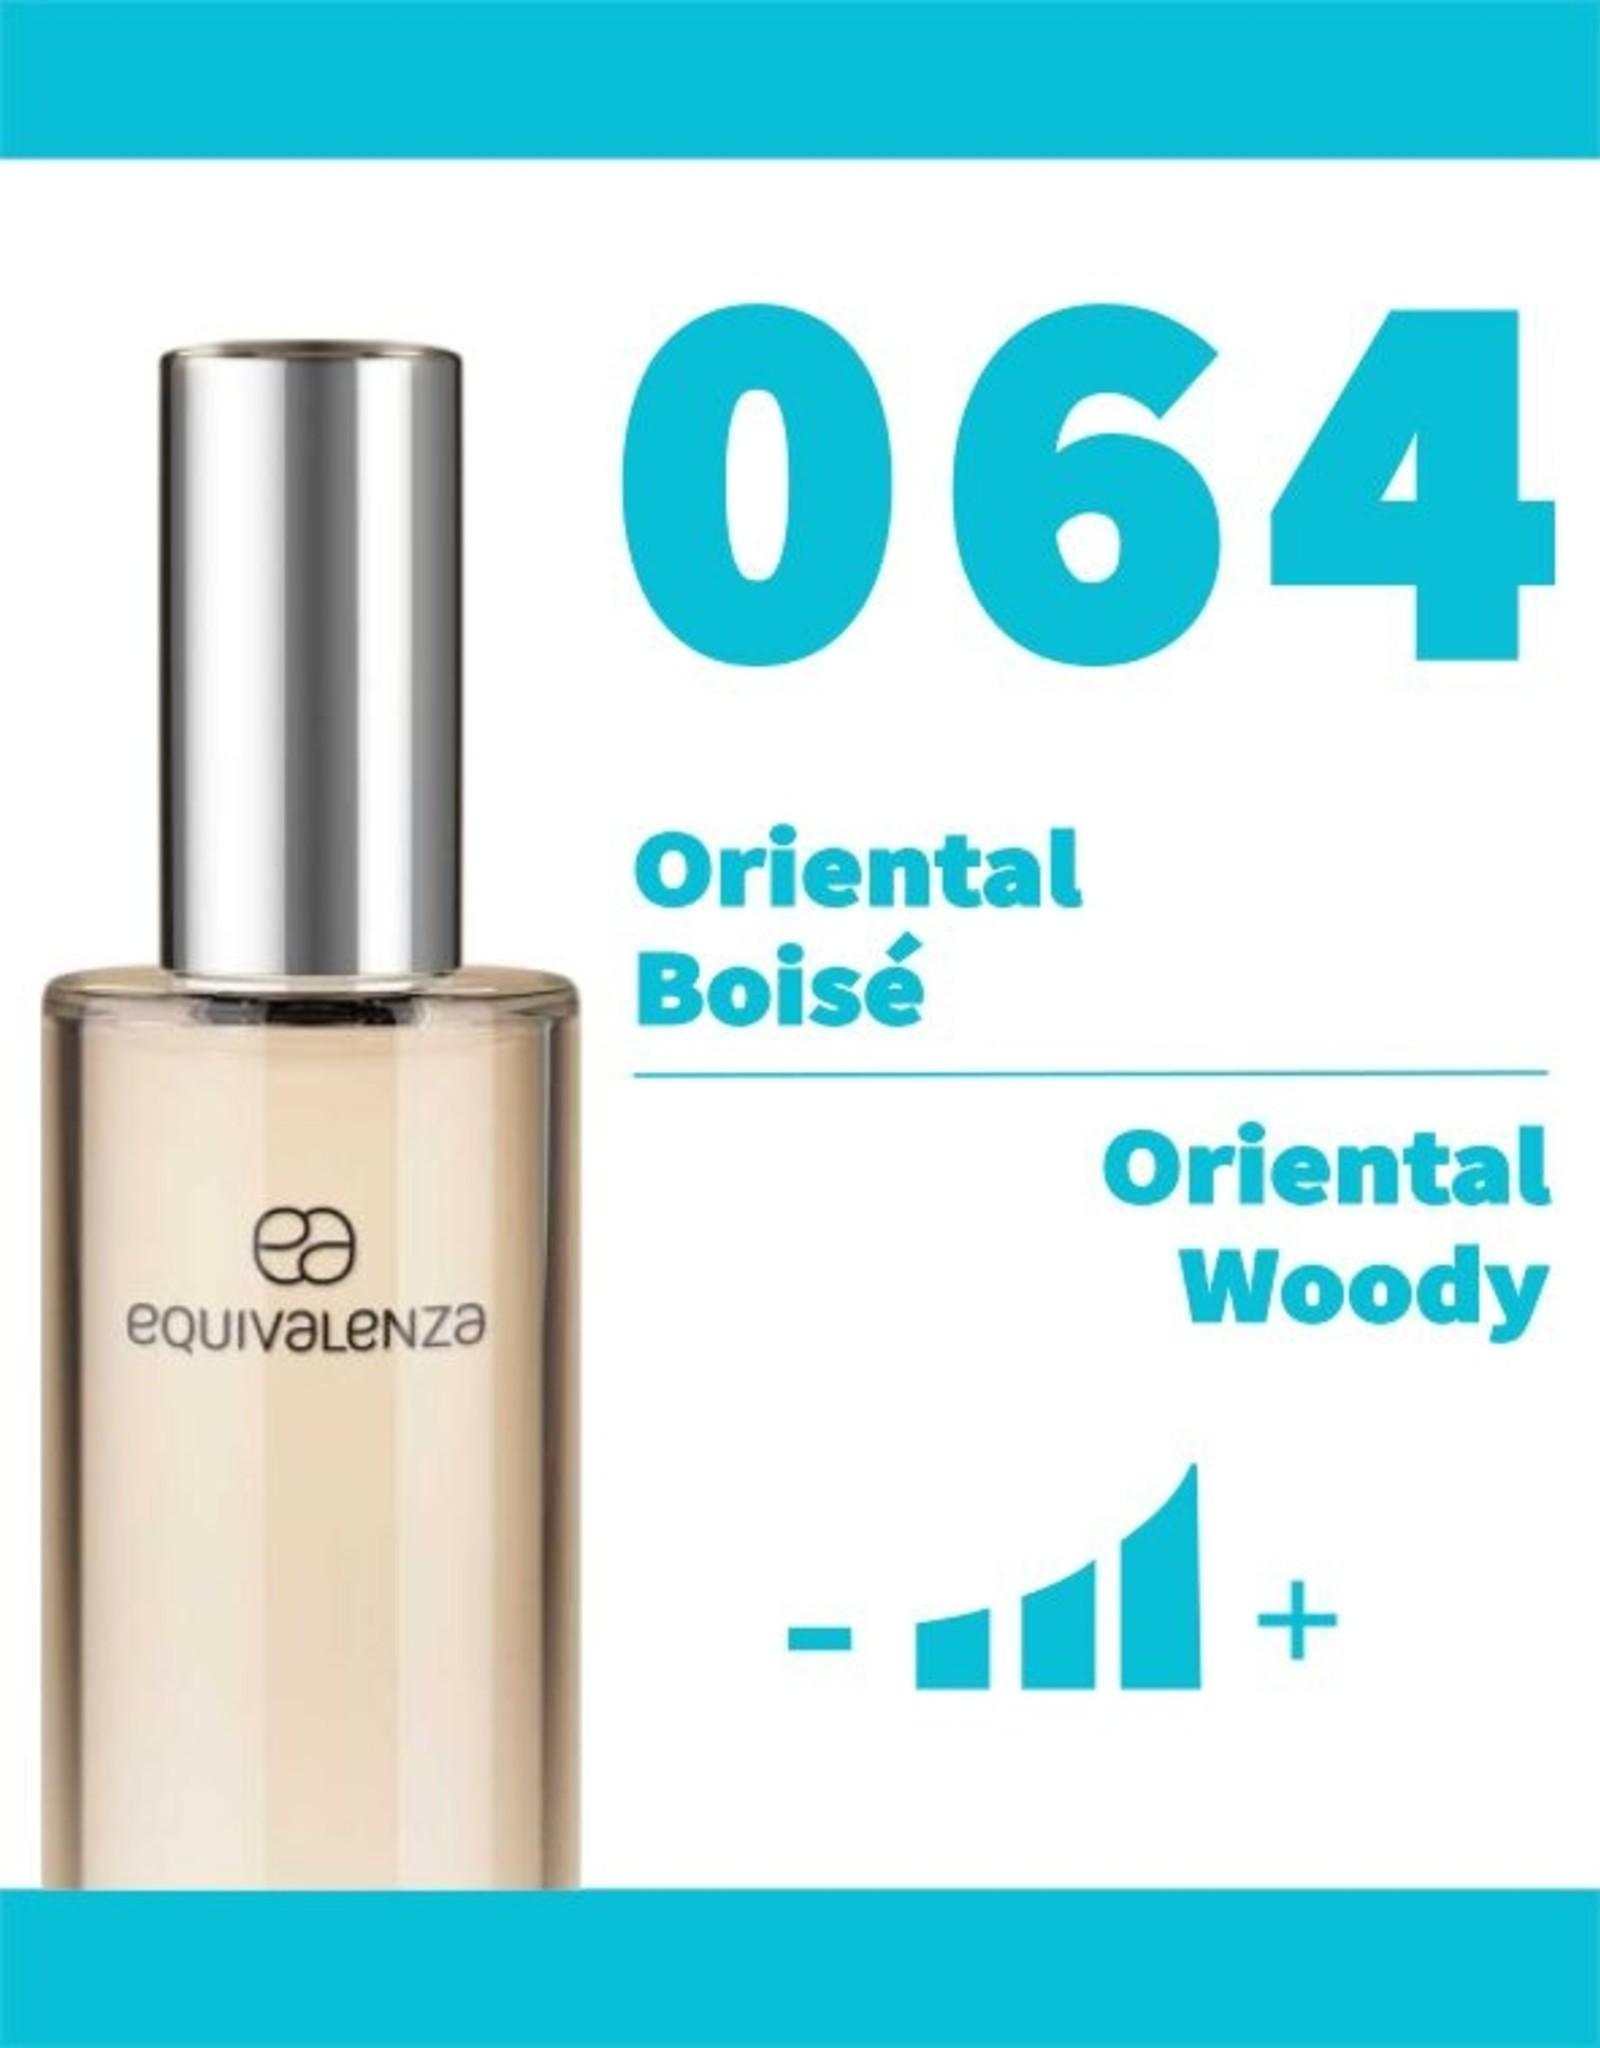 Equivalenza Oriental Woody 064